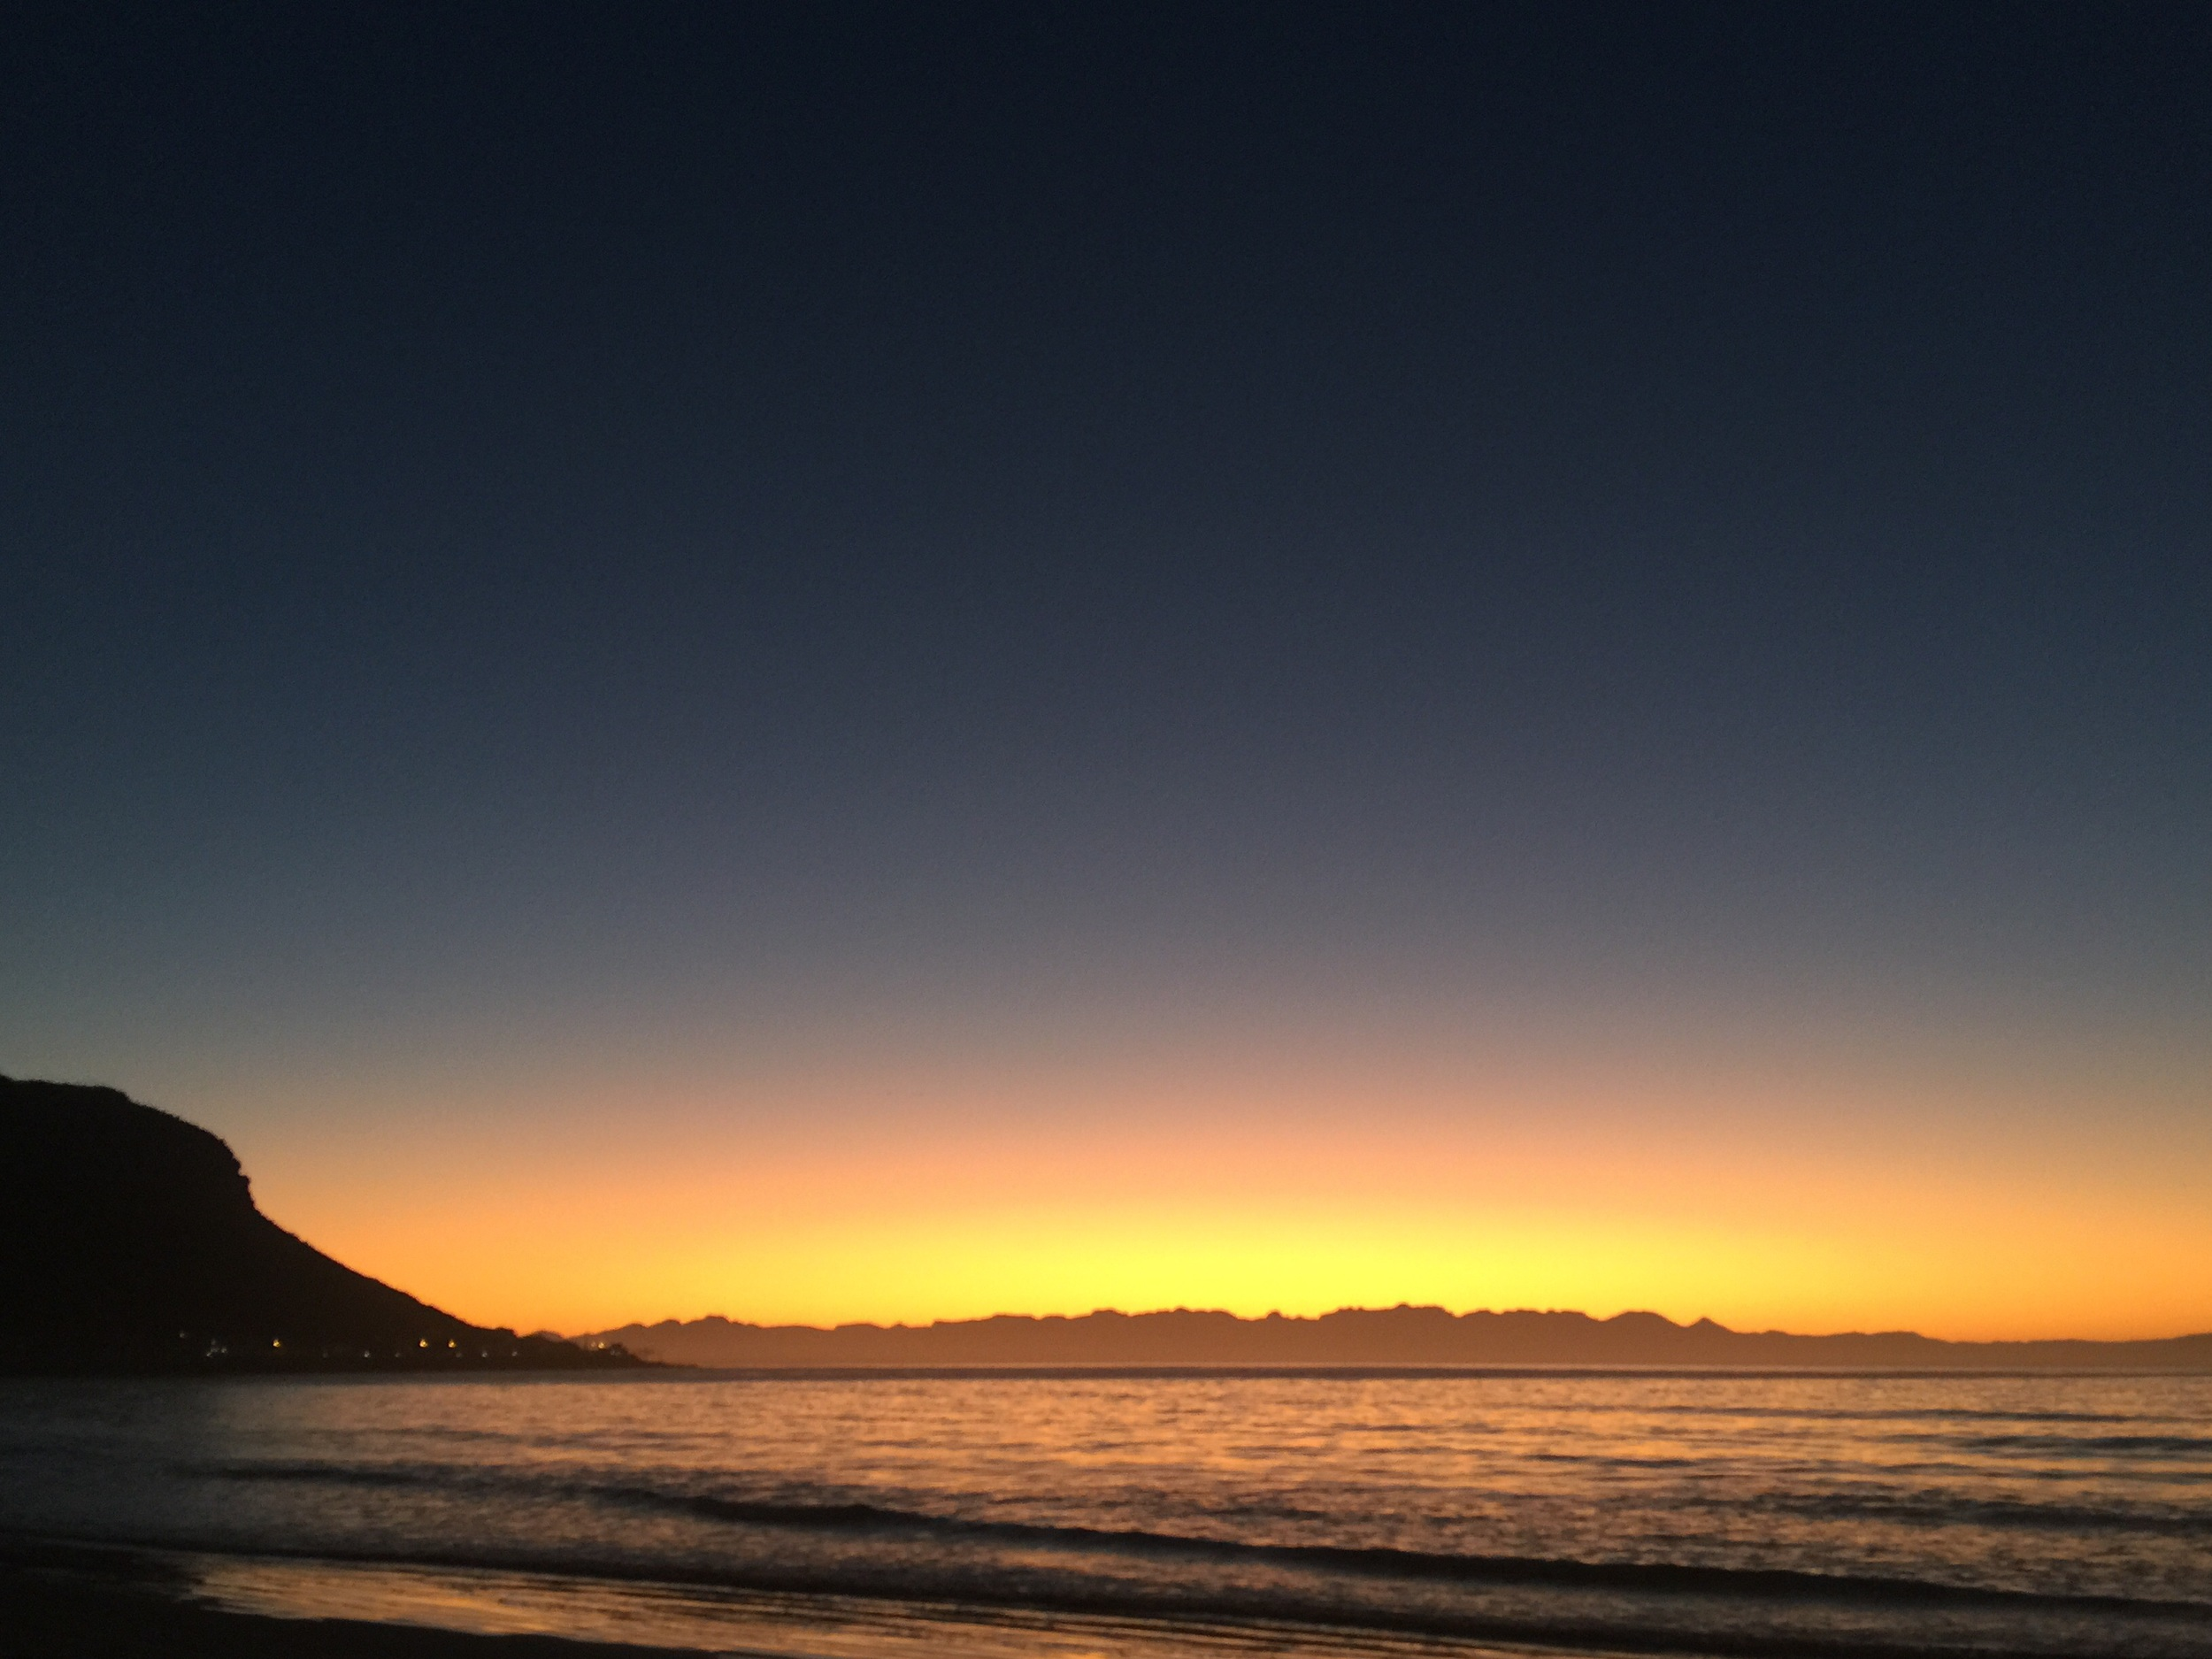 Sunrise, Fish Hoek, Southern Peninsula, Cape Town